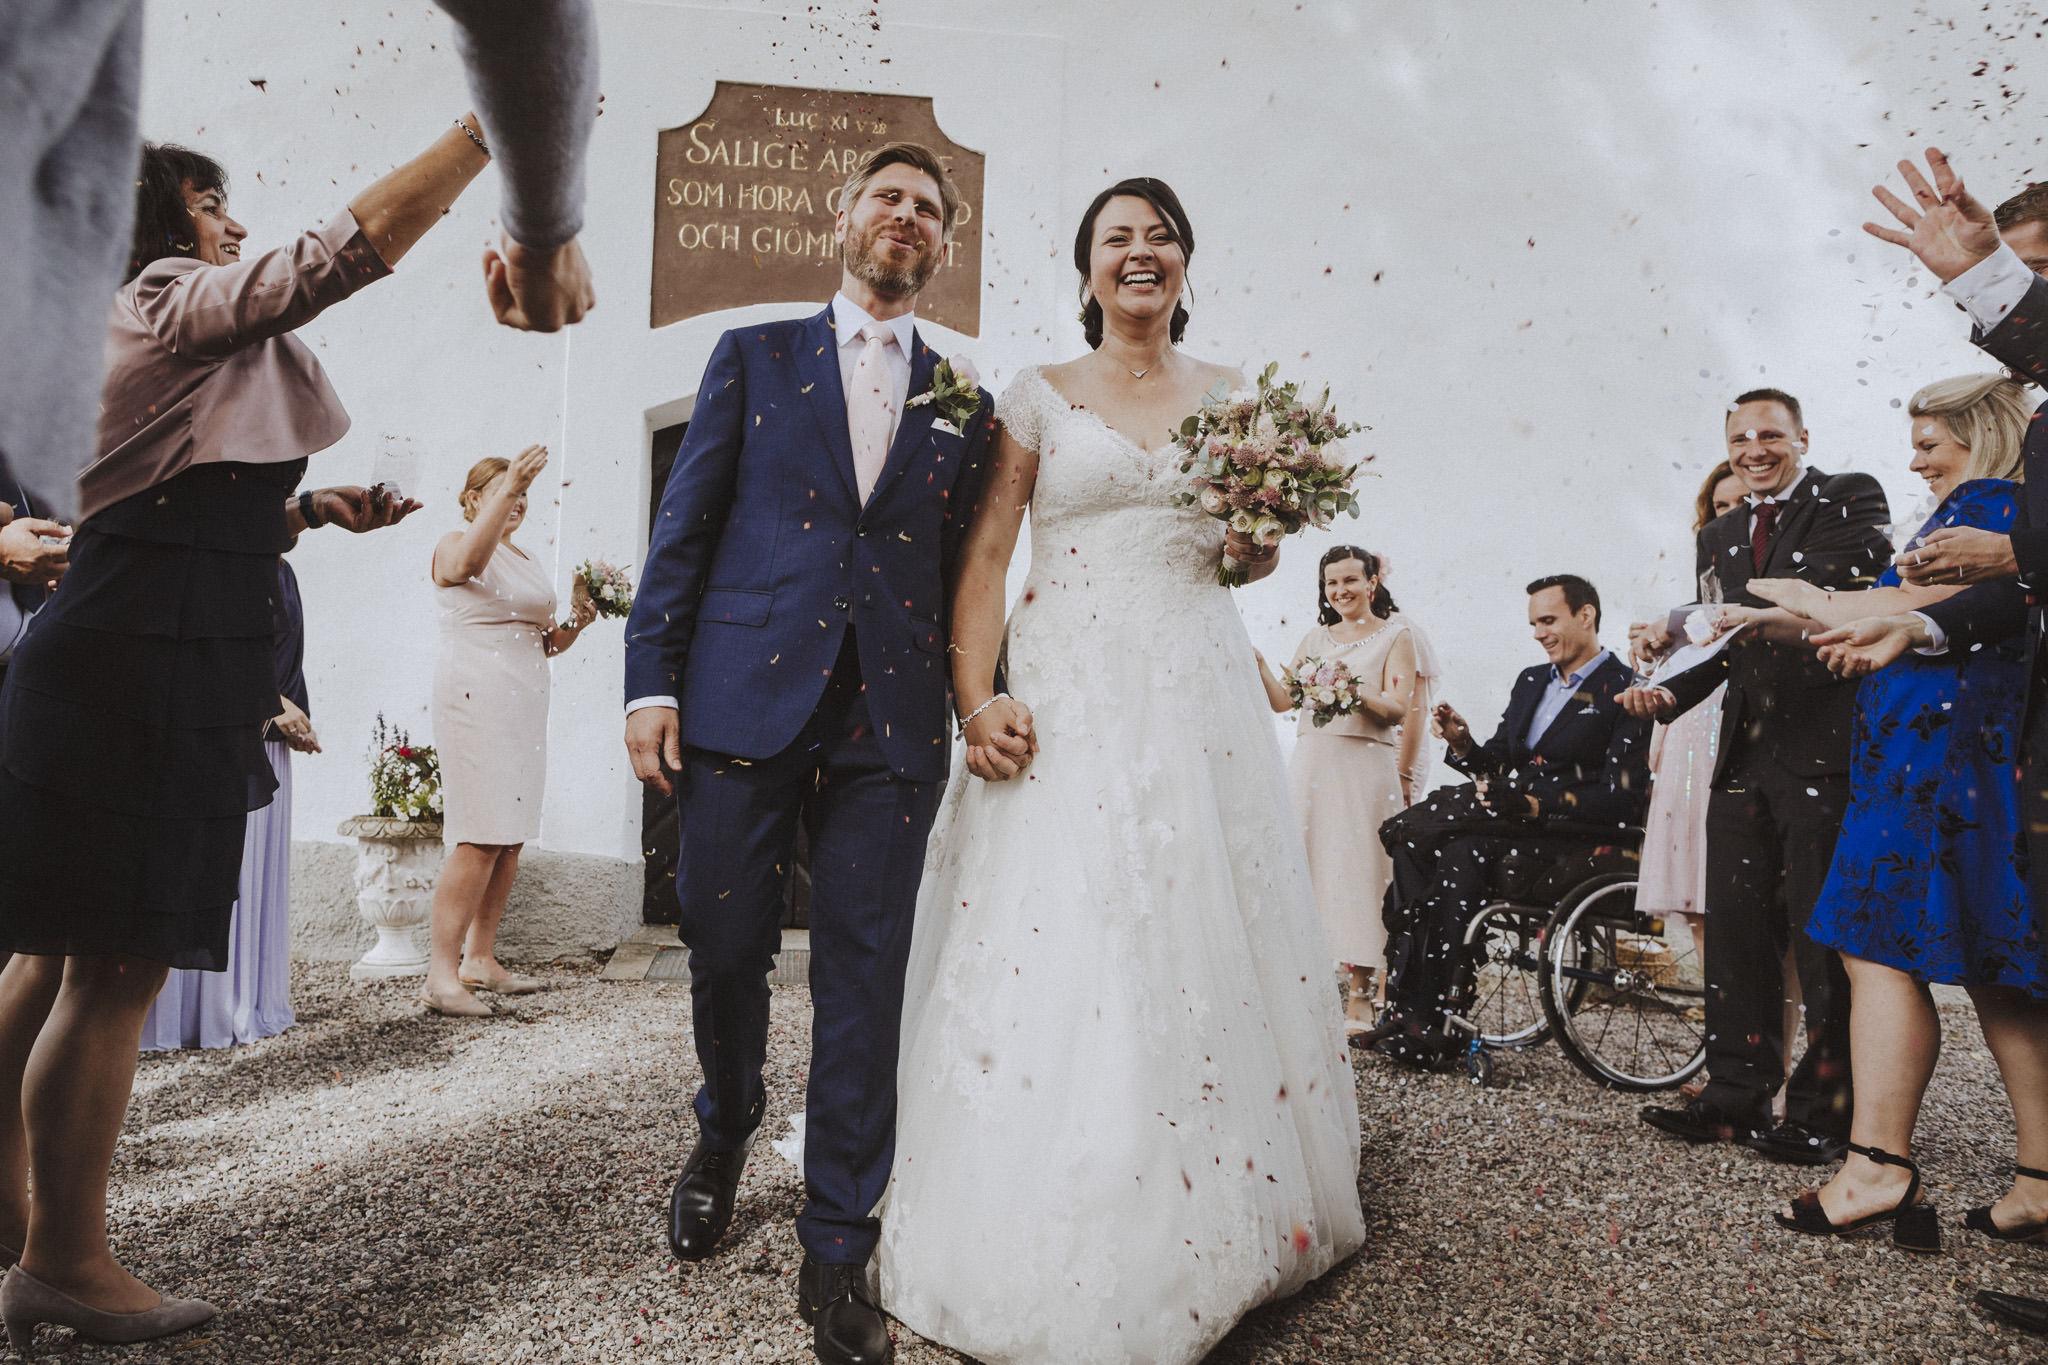 bröllop-dufweholm-herrgård-katrineholm-sörmland-bröllopsfoto